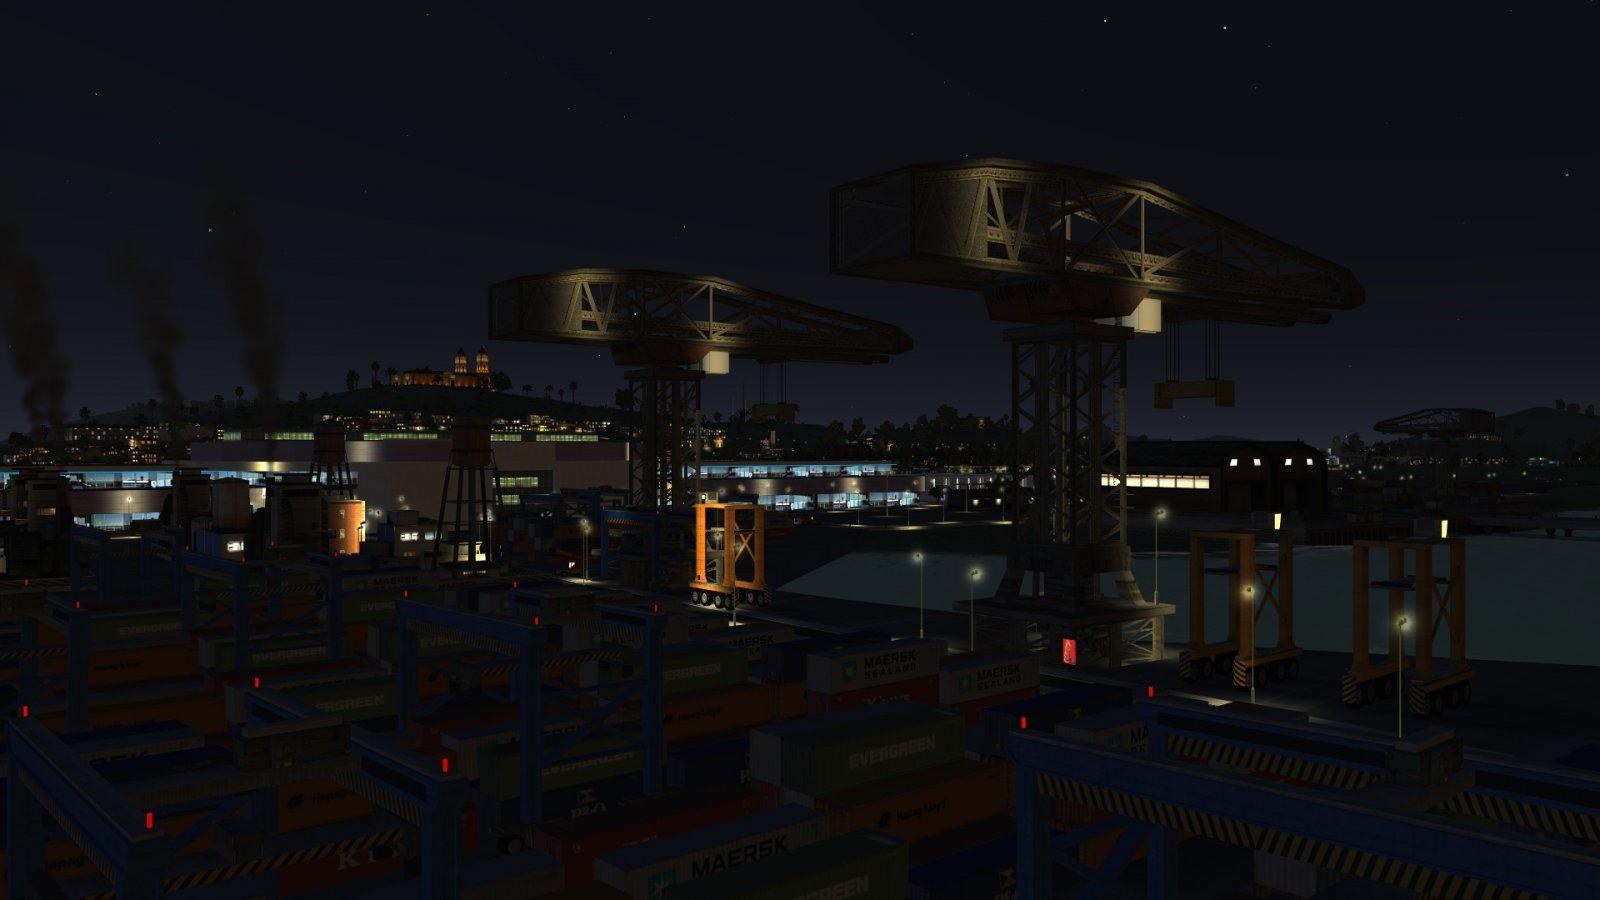 cxl_screenshot_porto santo_10.jpg